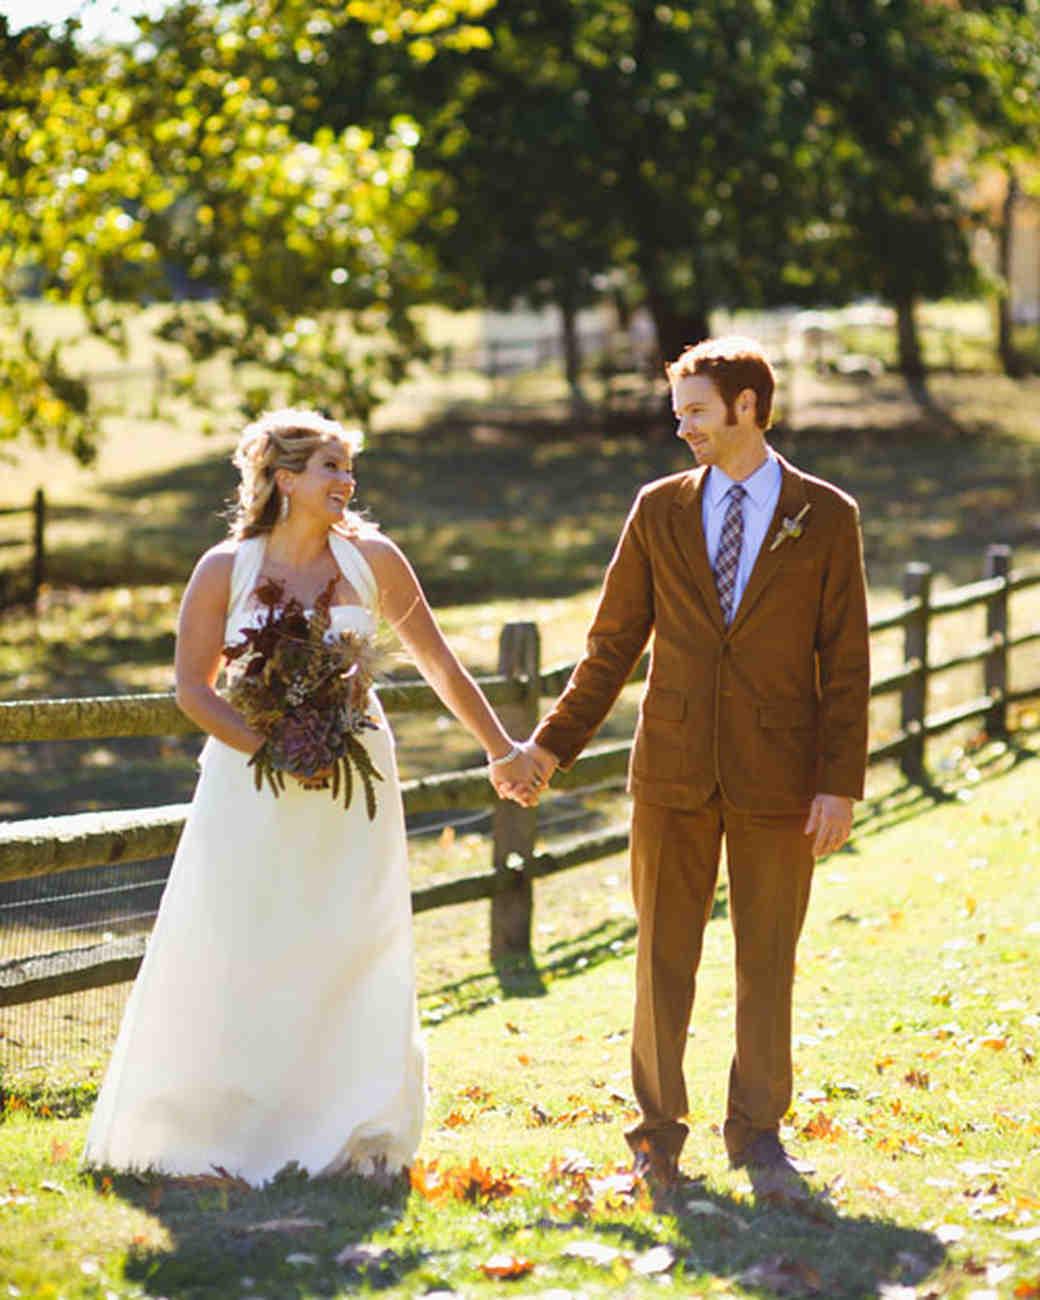 A Rustic Autumn Wedding In A Barn In Pennsylvania